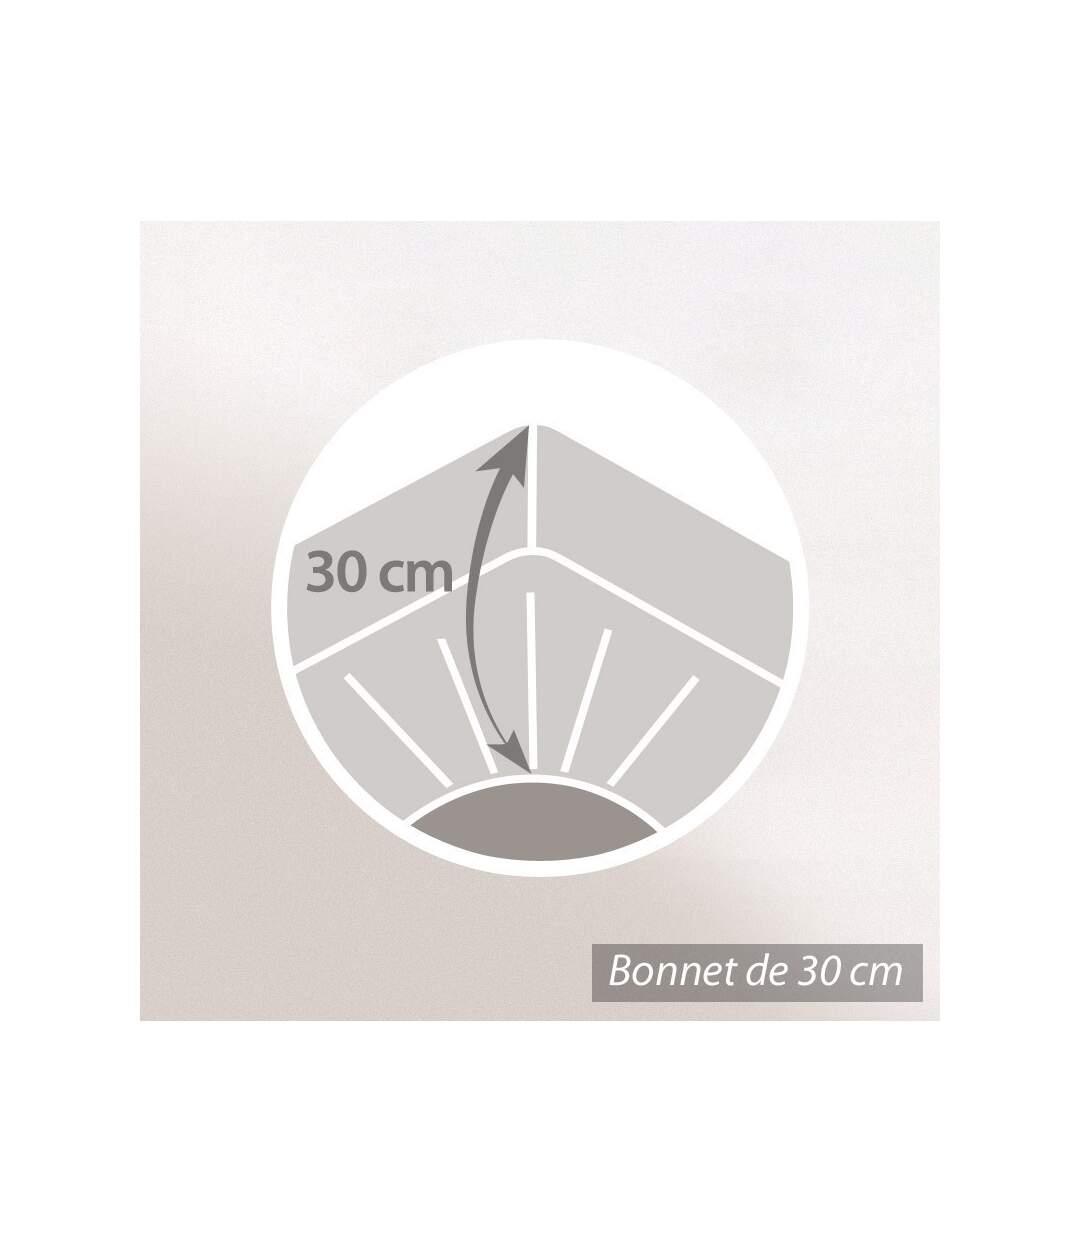 Protège matelas imperméable Antony blanc 110x190 Bonnet 30 cm